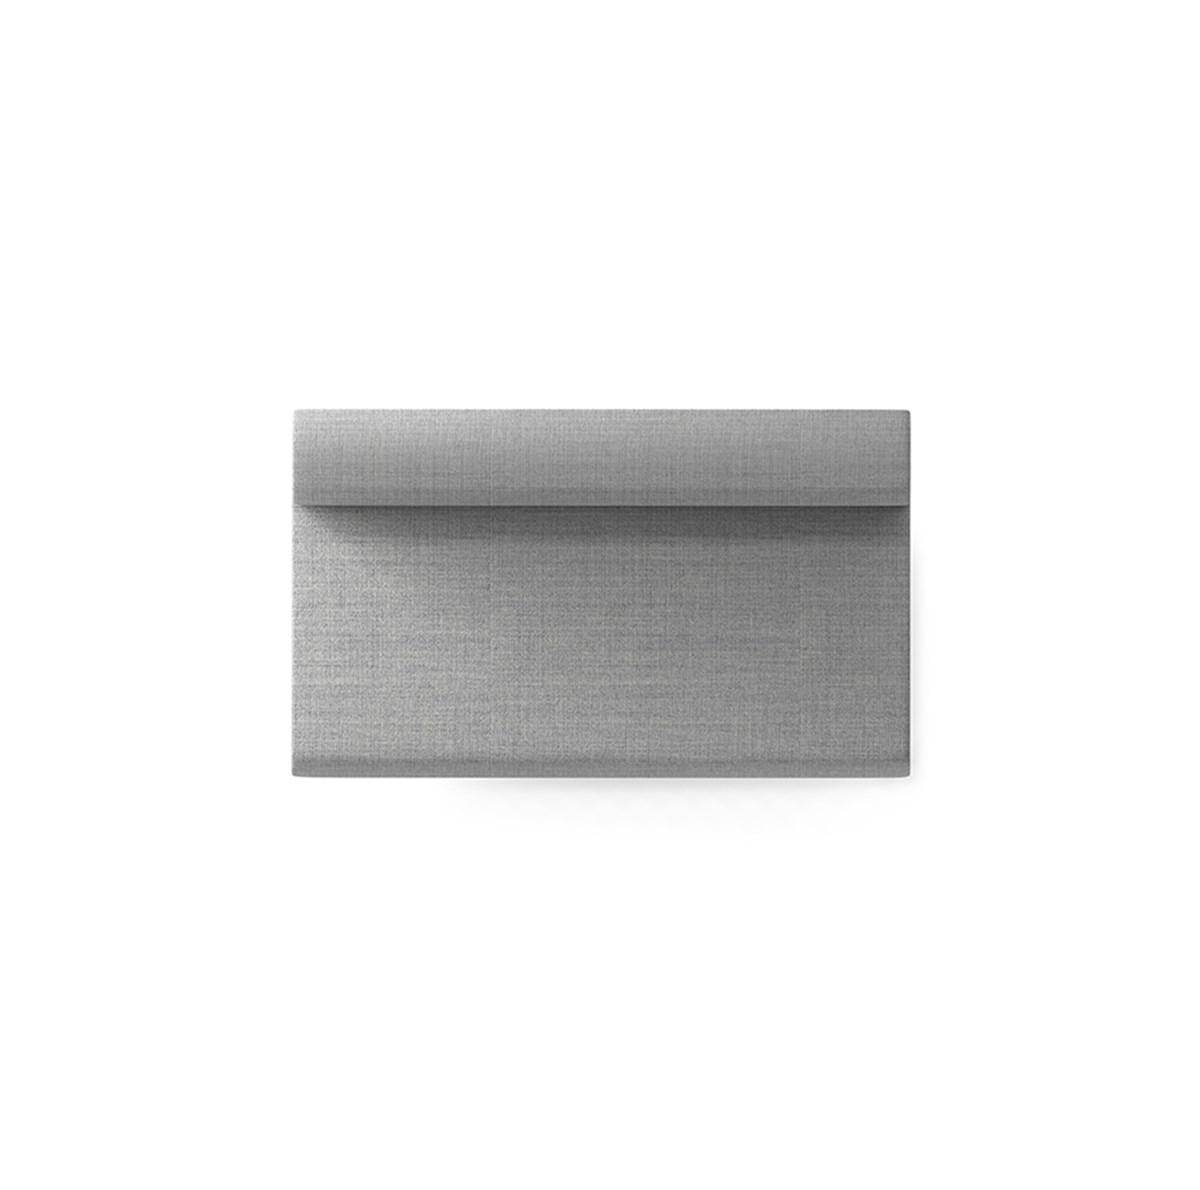 Neospace-Ridgeway-Sofa-System-Contract-Matisse-4